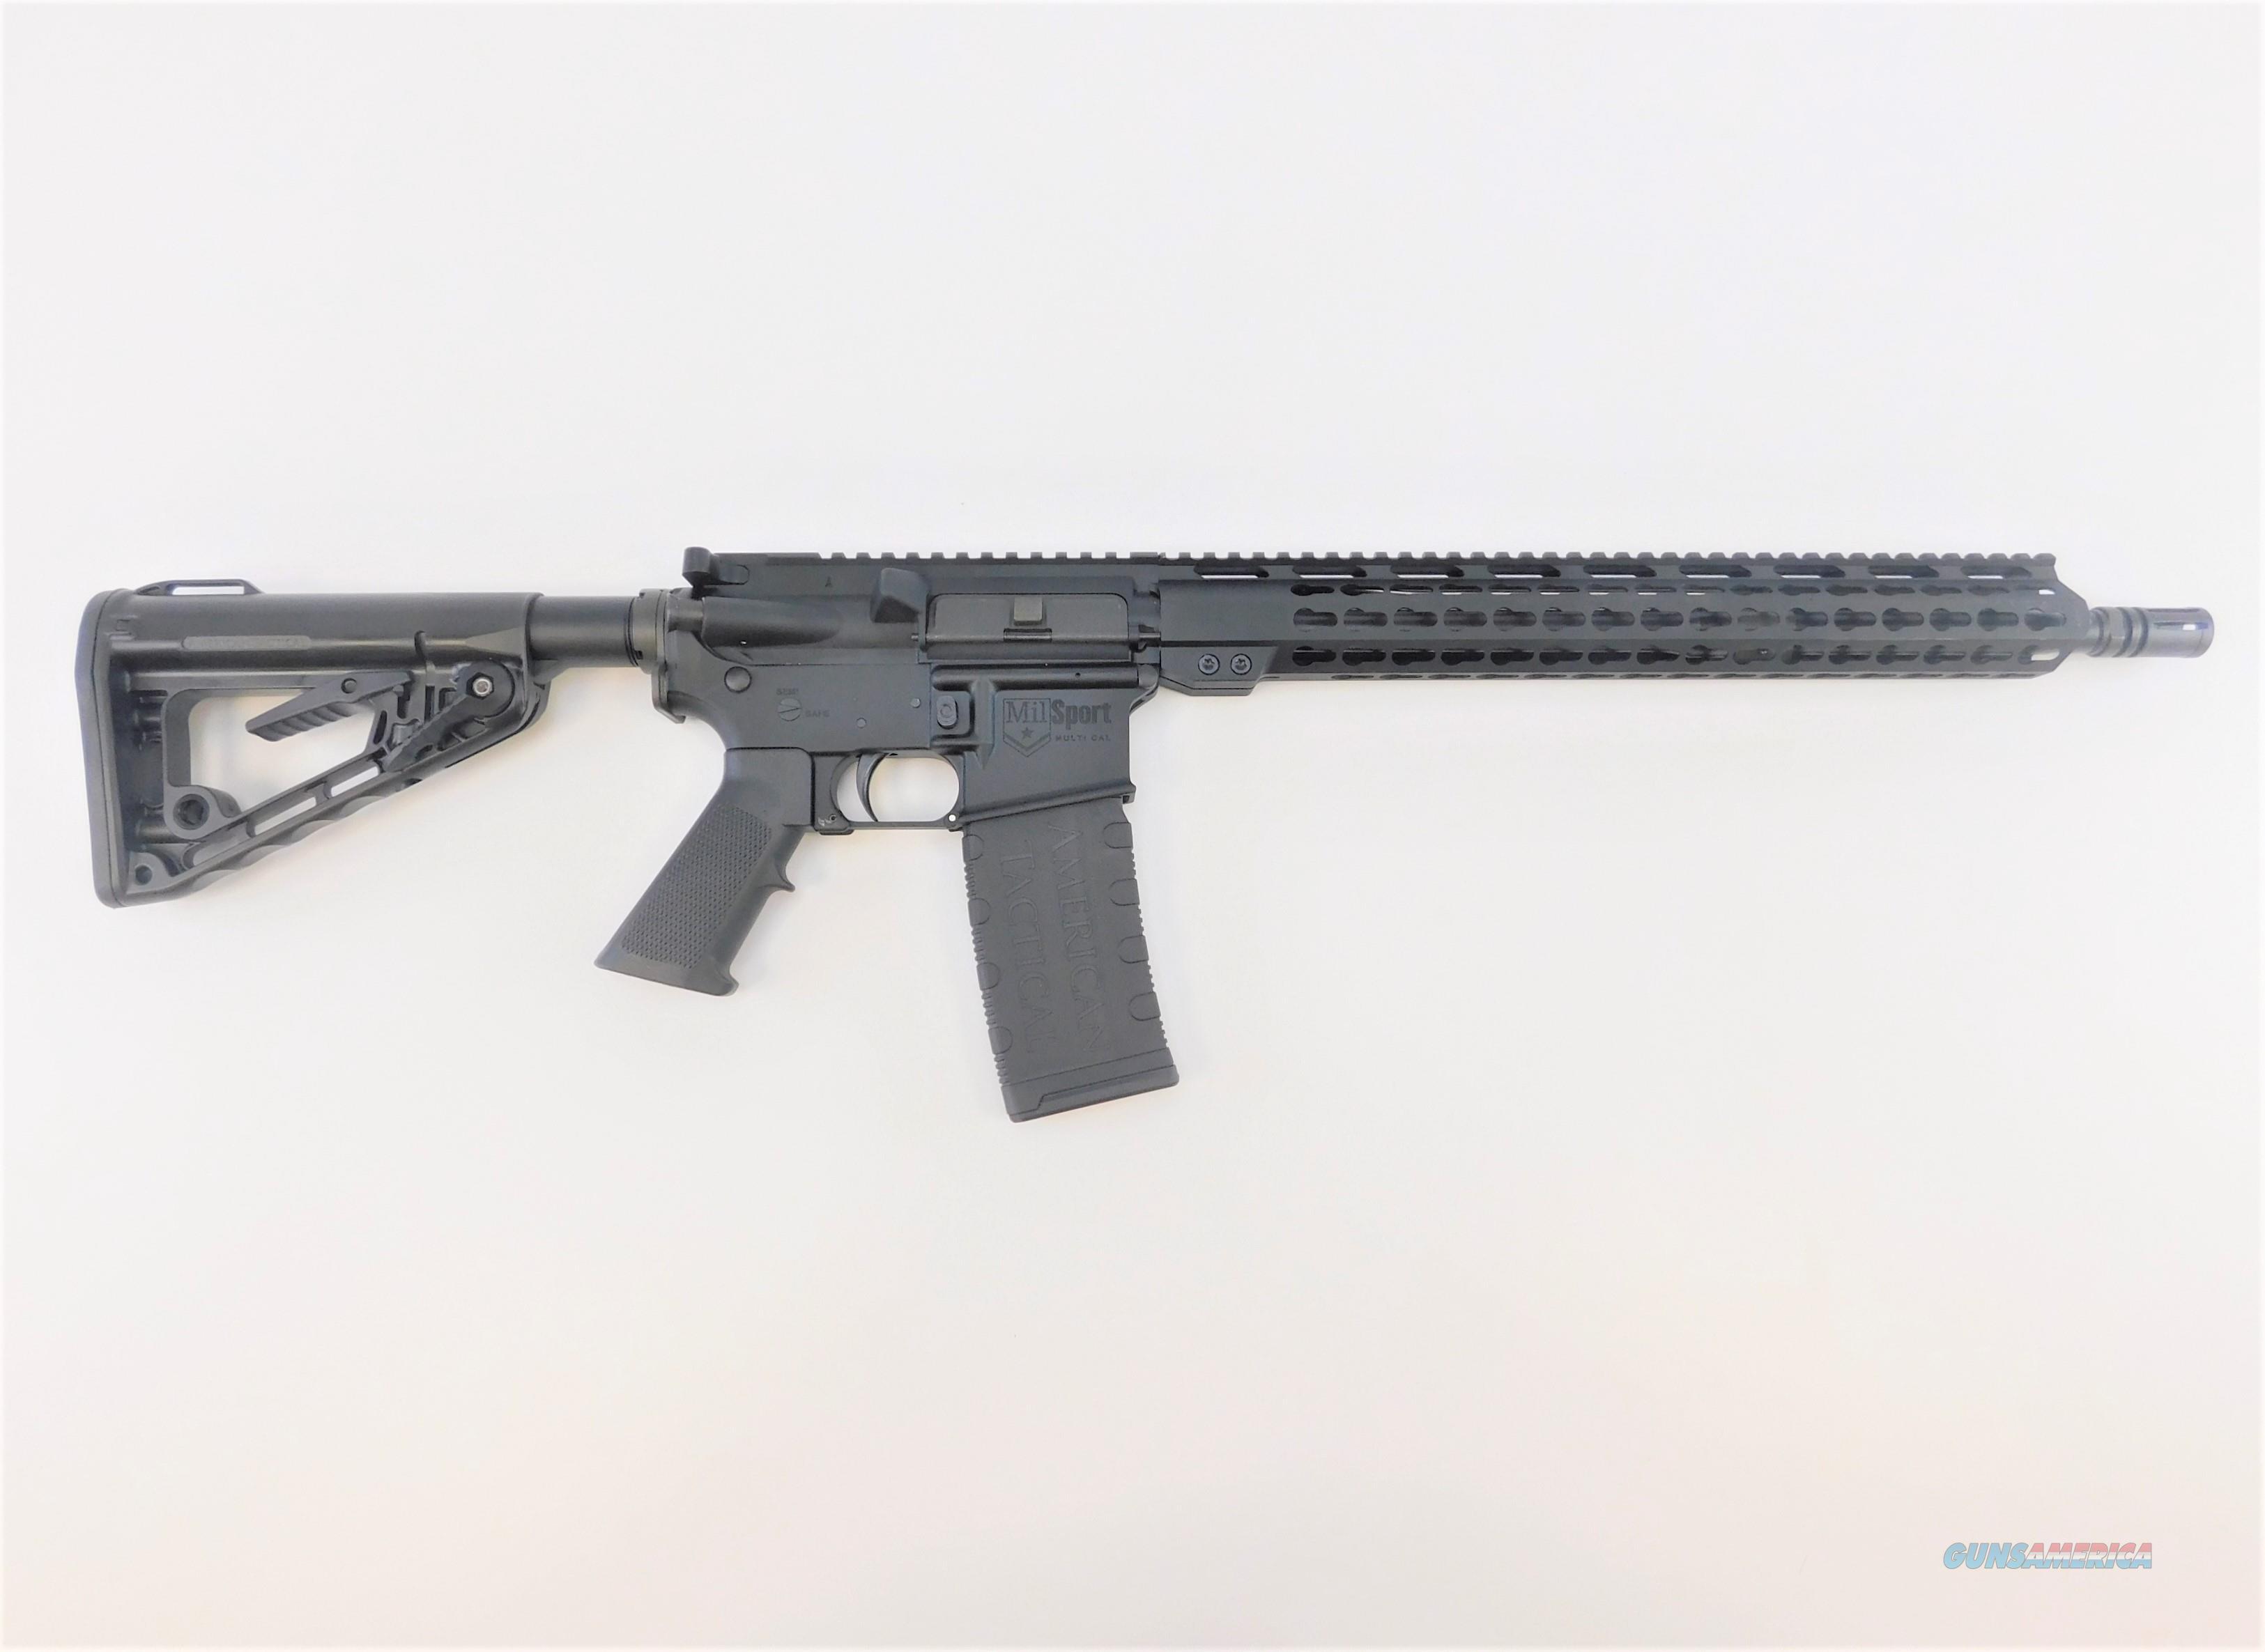 "ATI RIA MILSPORT AR-15 5.56 NATO 16"" ATIG15MS556MM  Guns > Rifles > American Tactical Imports Rifles"